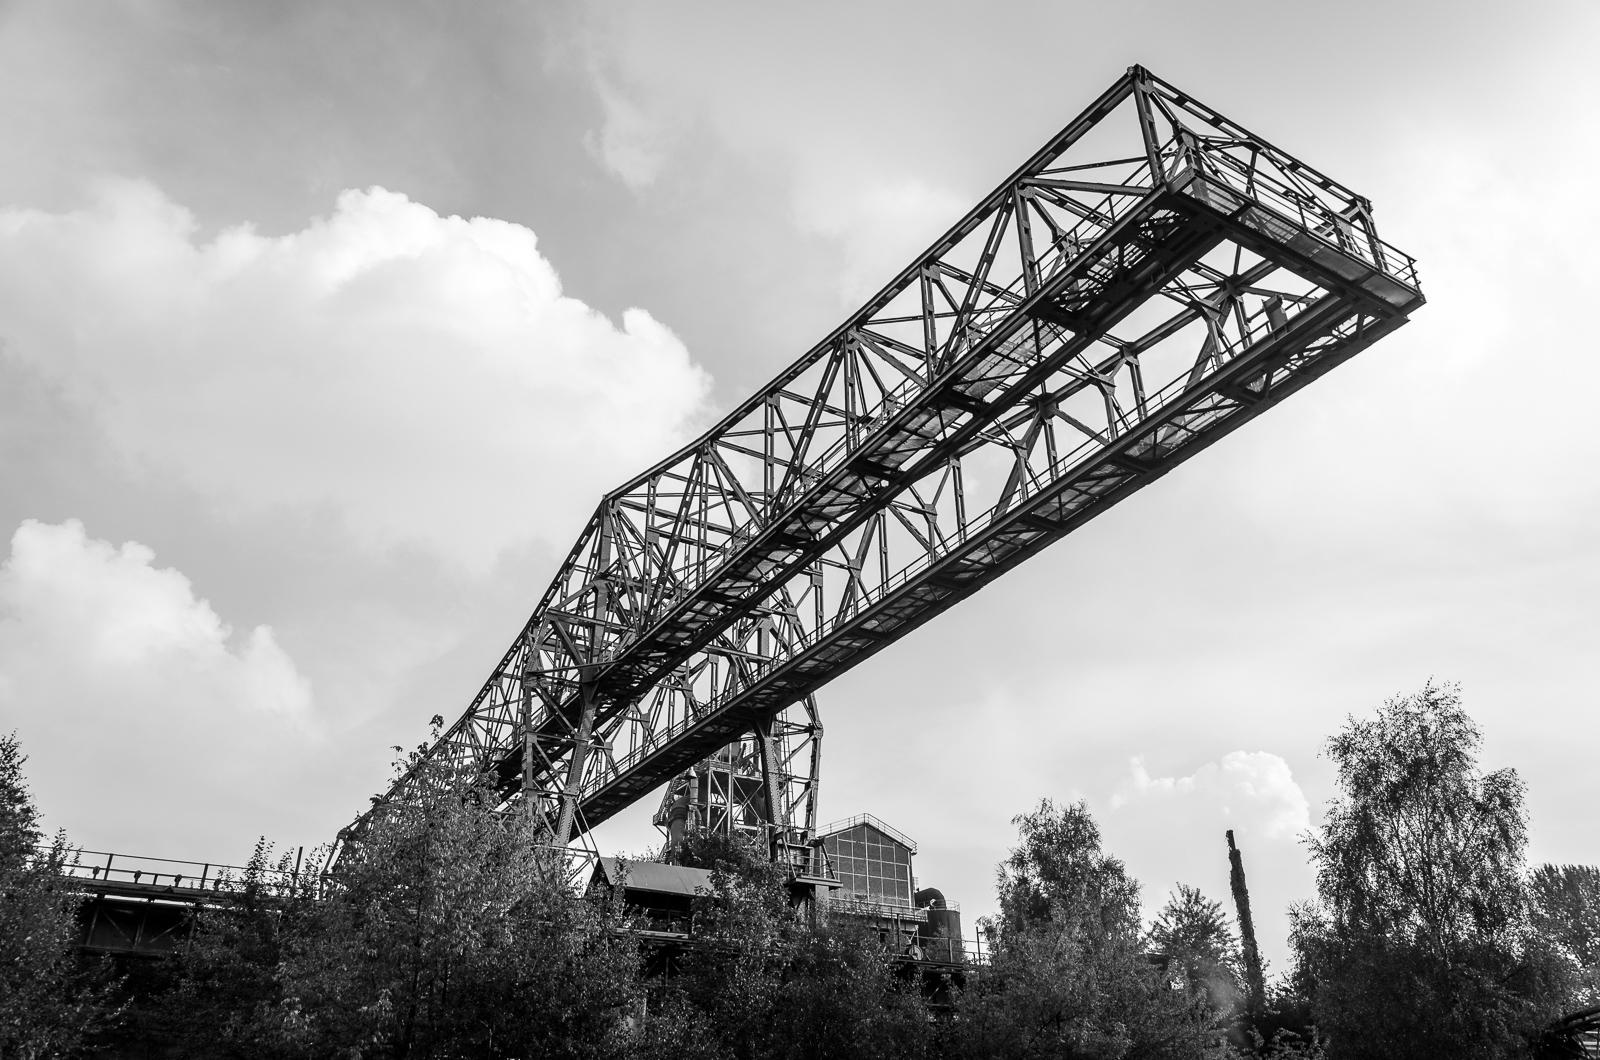 Brückenkran